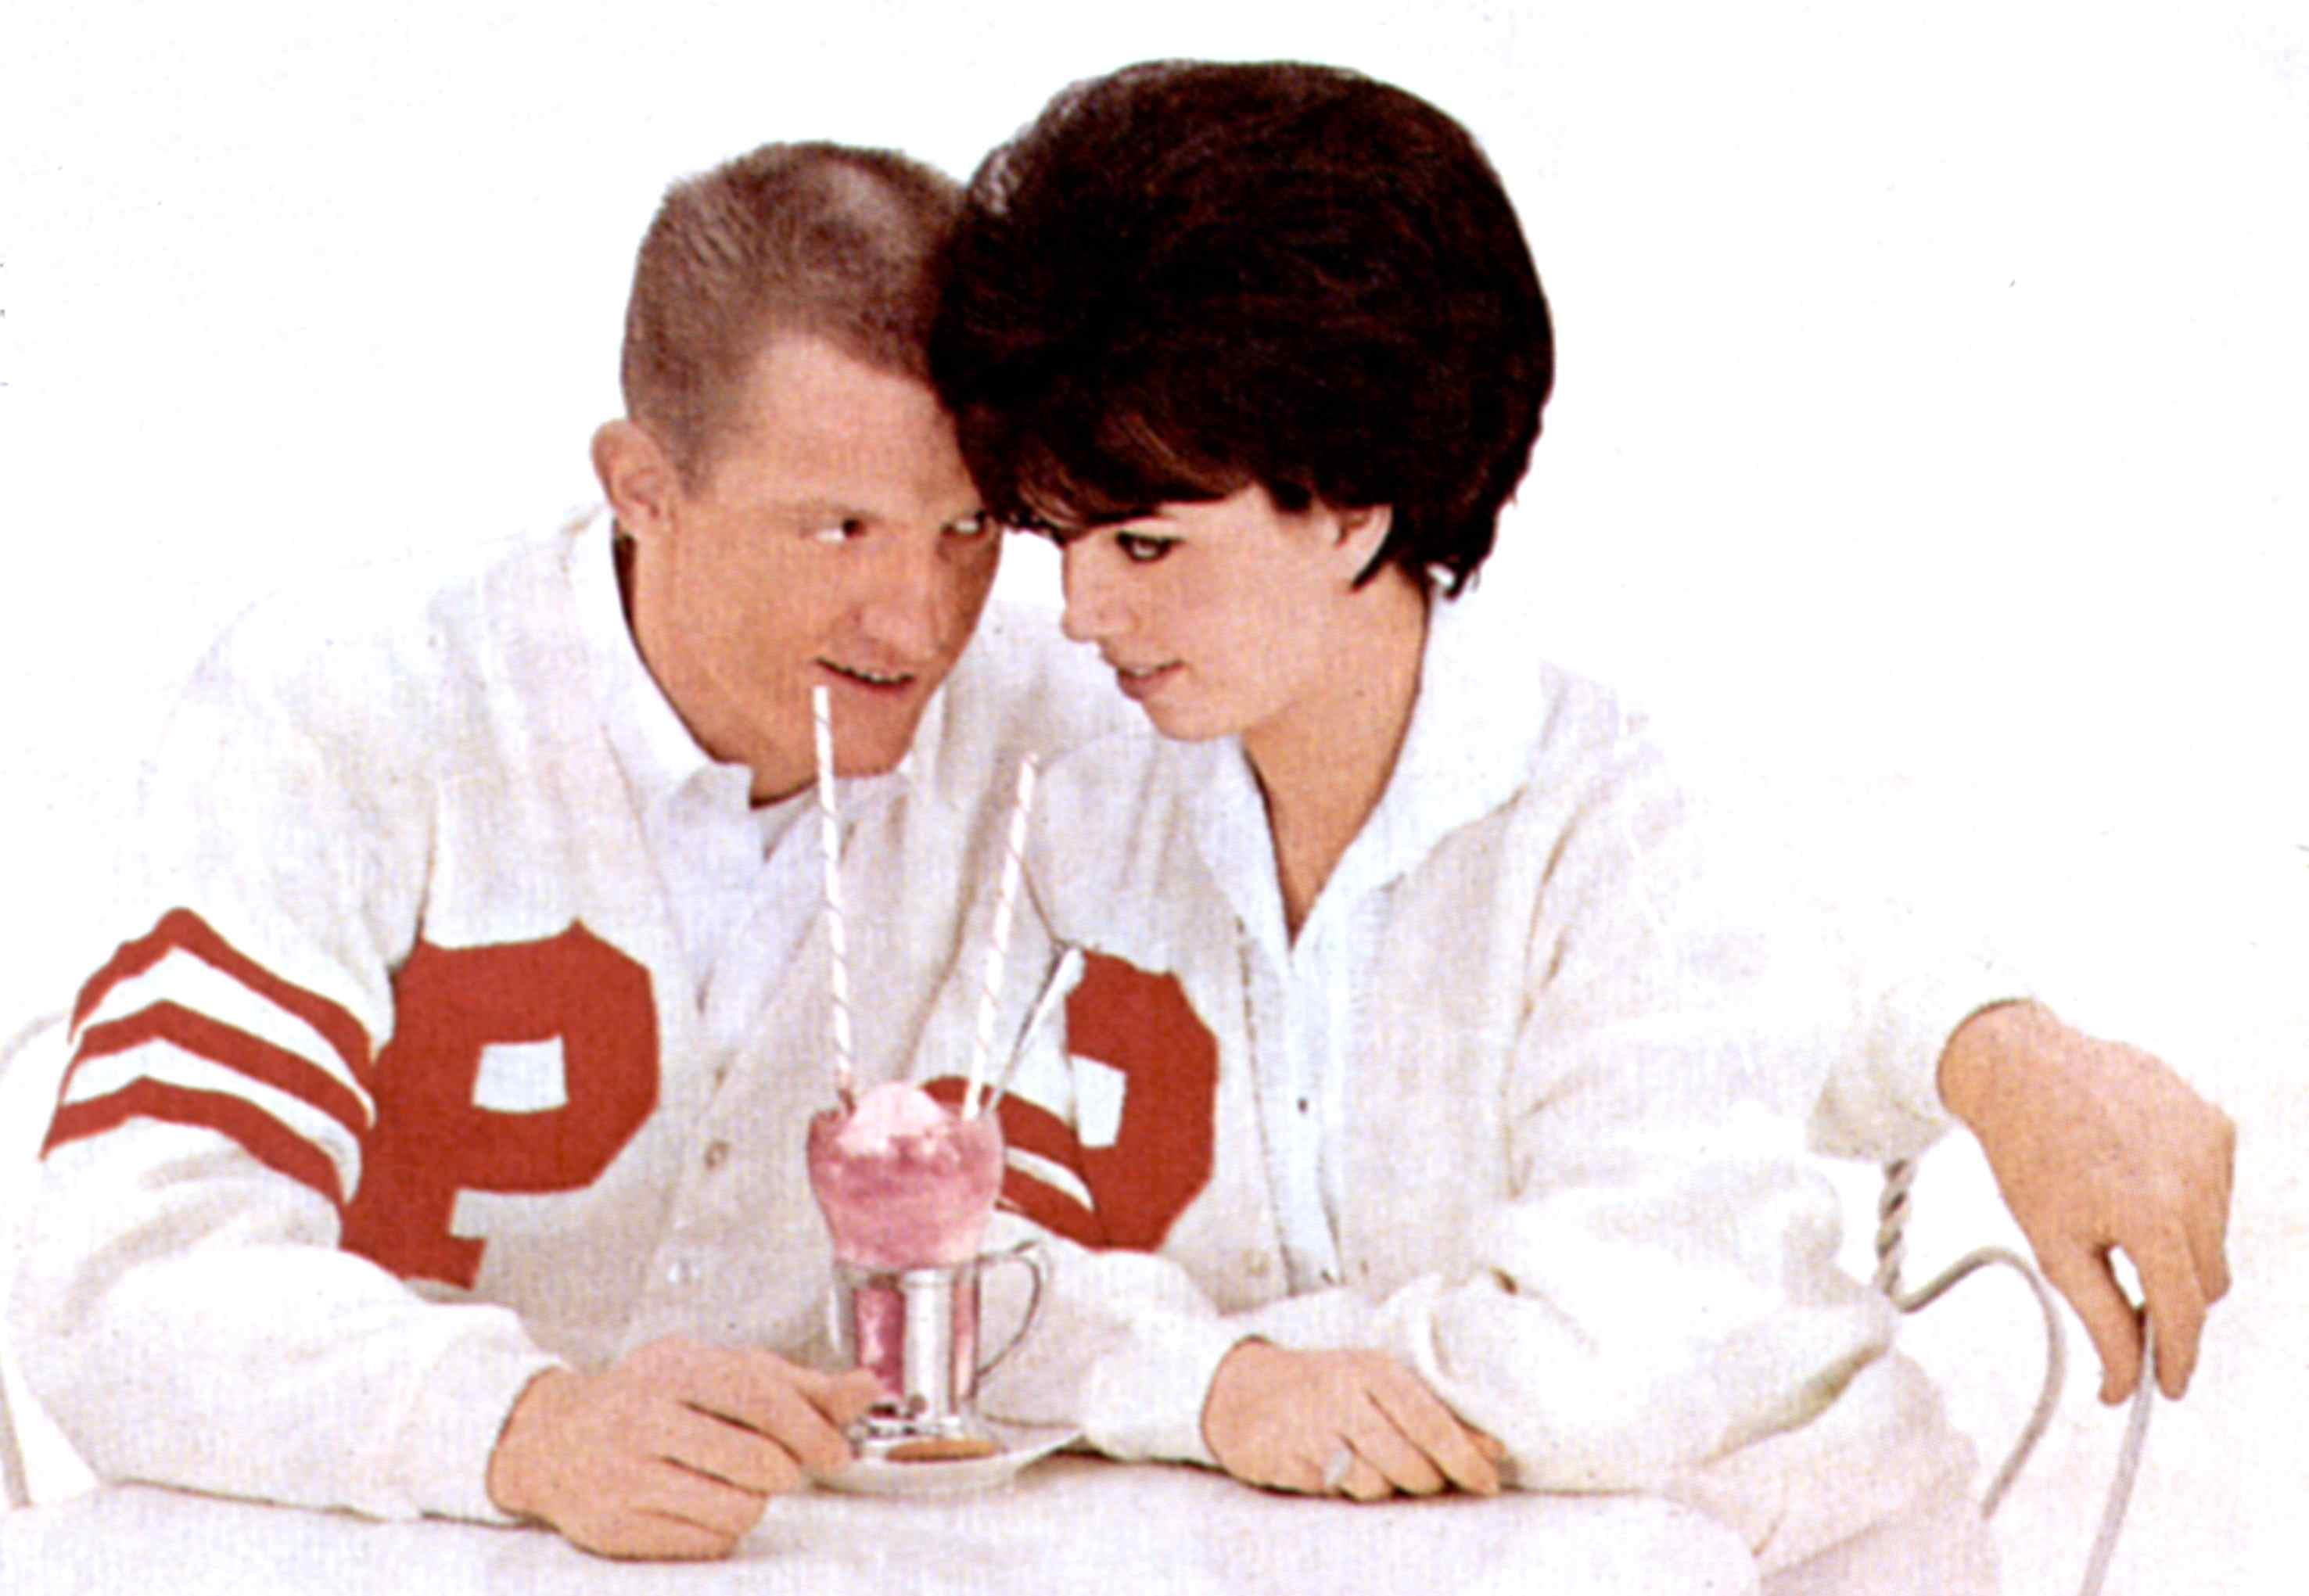 Paul and Paula 1963